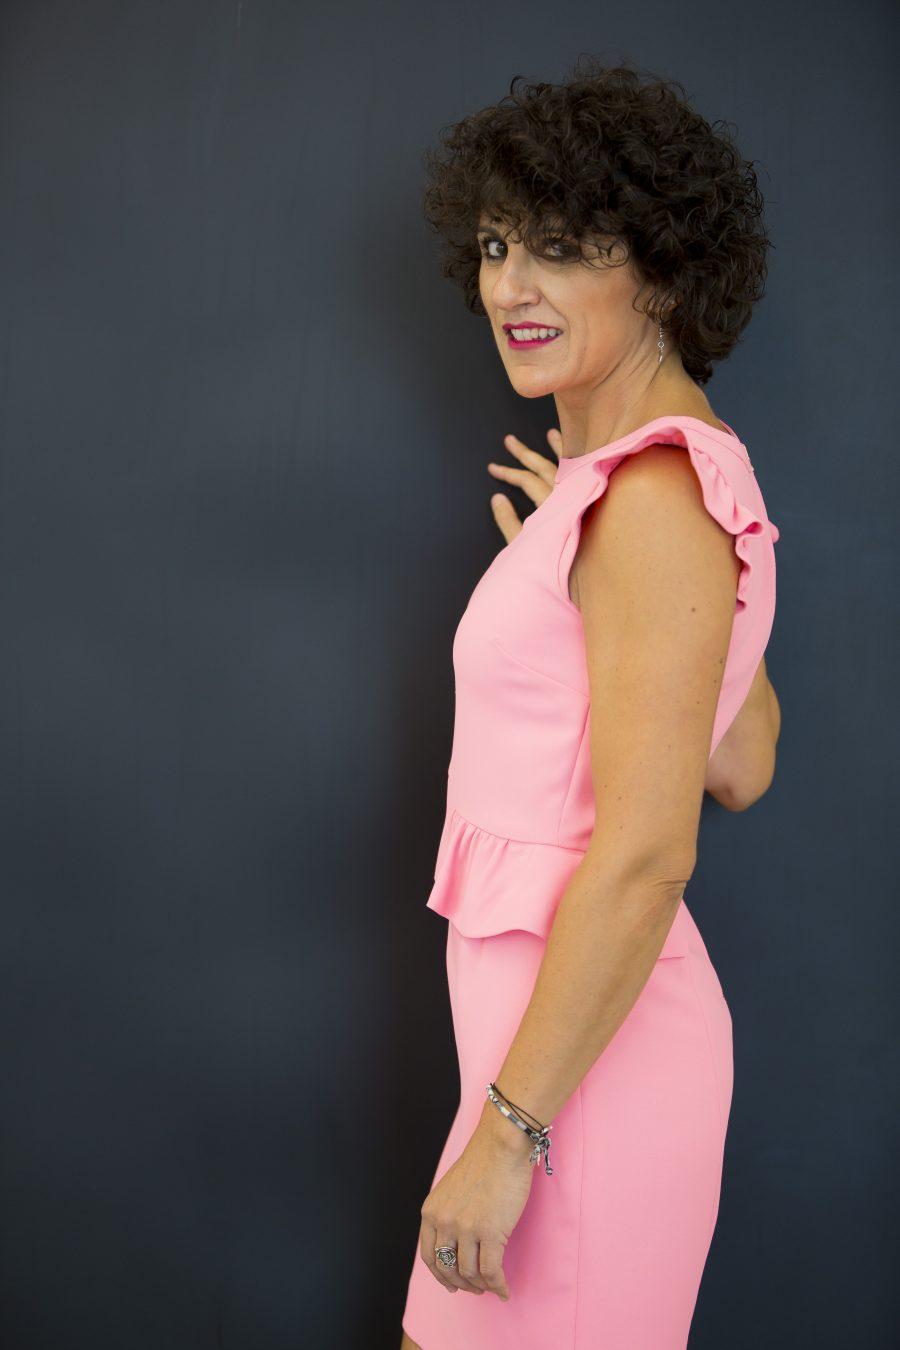 Vestido tubo, lady dress, sandro, Rebeca Valdivia, Miss Clov, curls, rizos, frills, pink, rosa, neon, Donostia